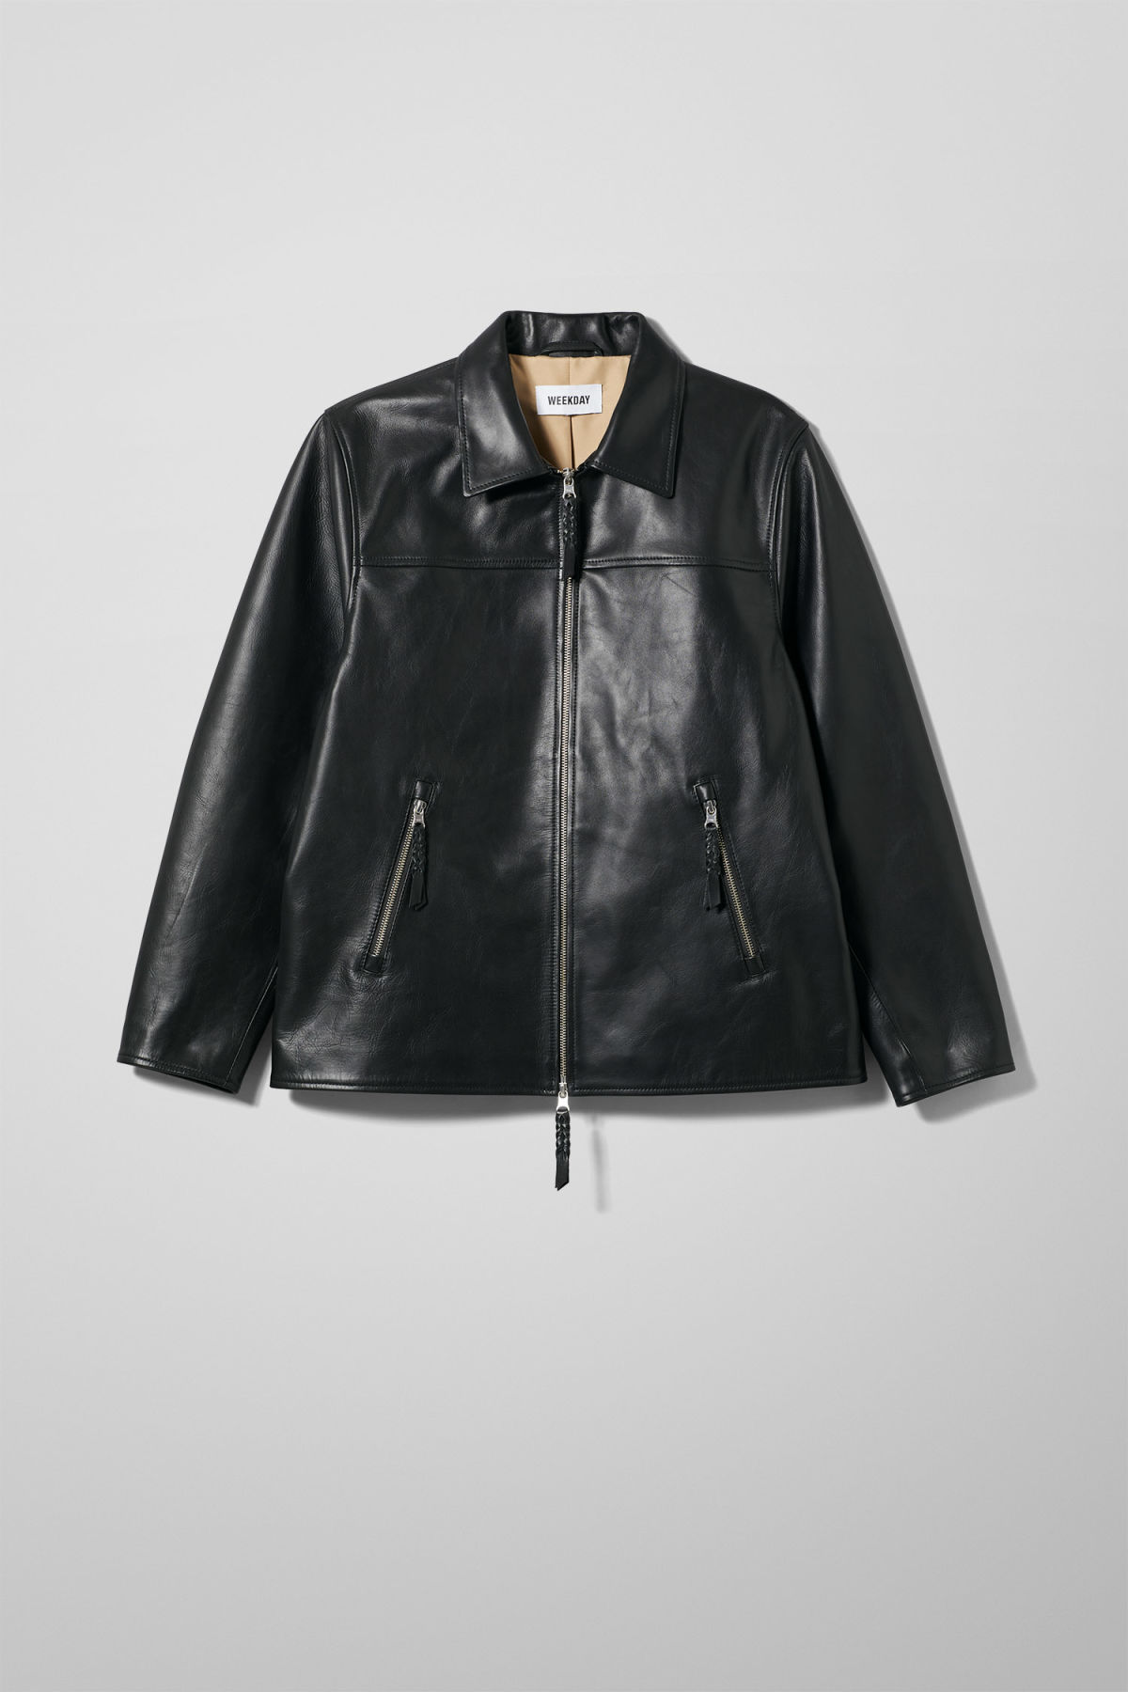 Jim Leather Jacket - Black